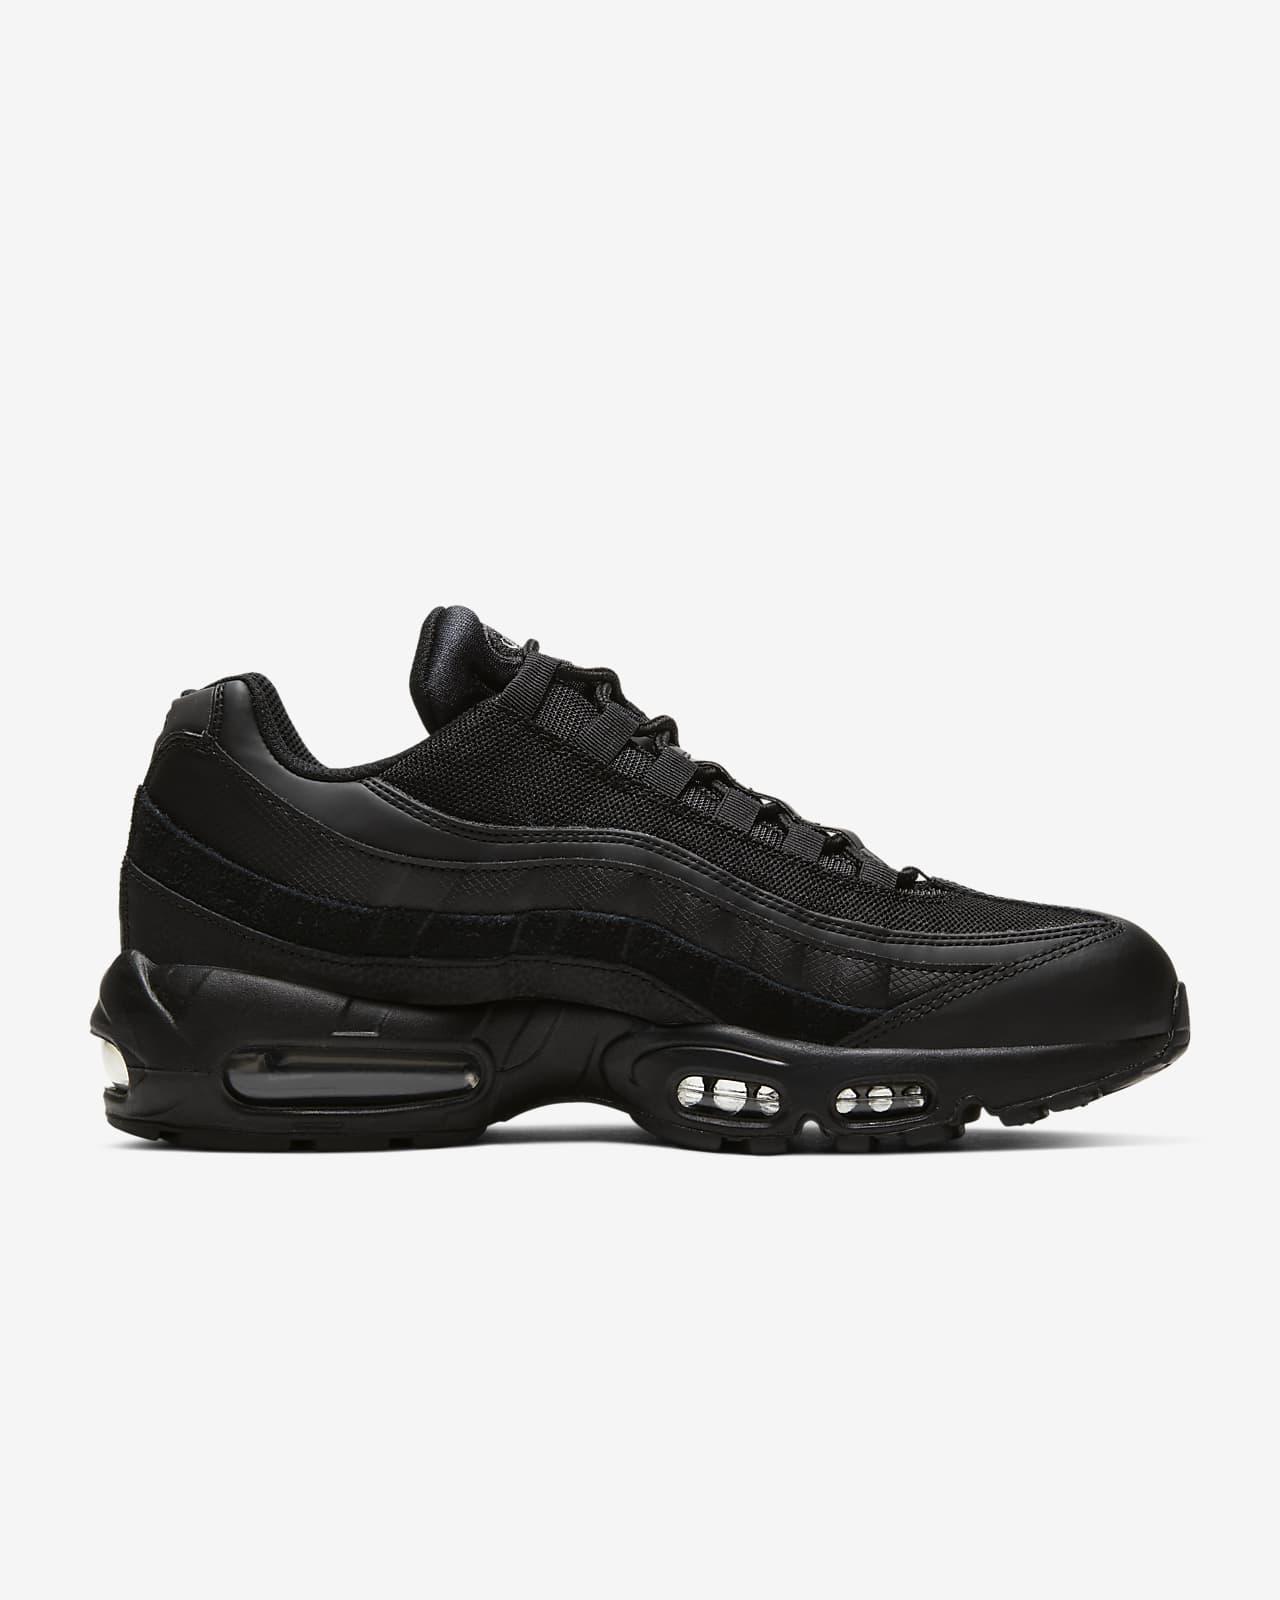 Chaussure Nike Air Max 95 Essential pour Homme